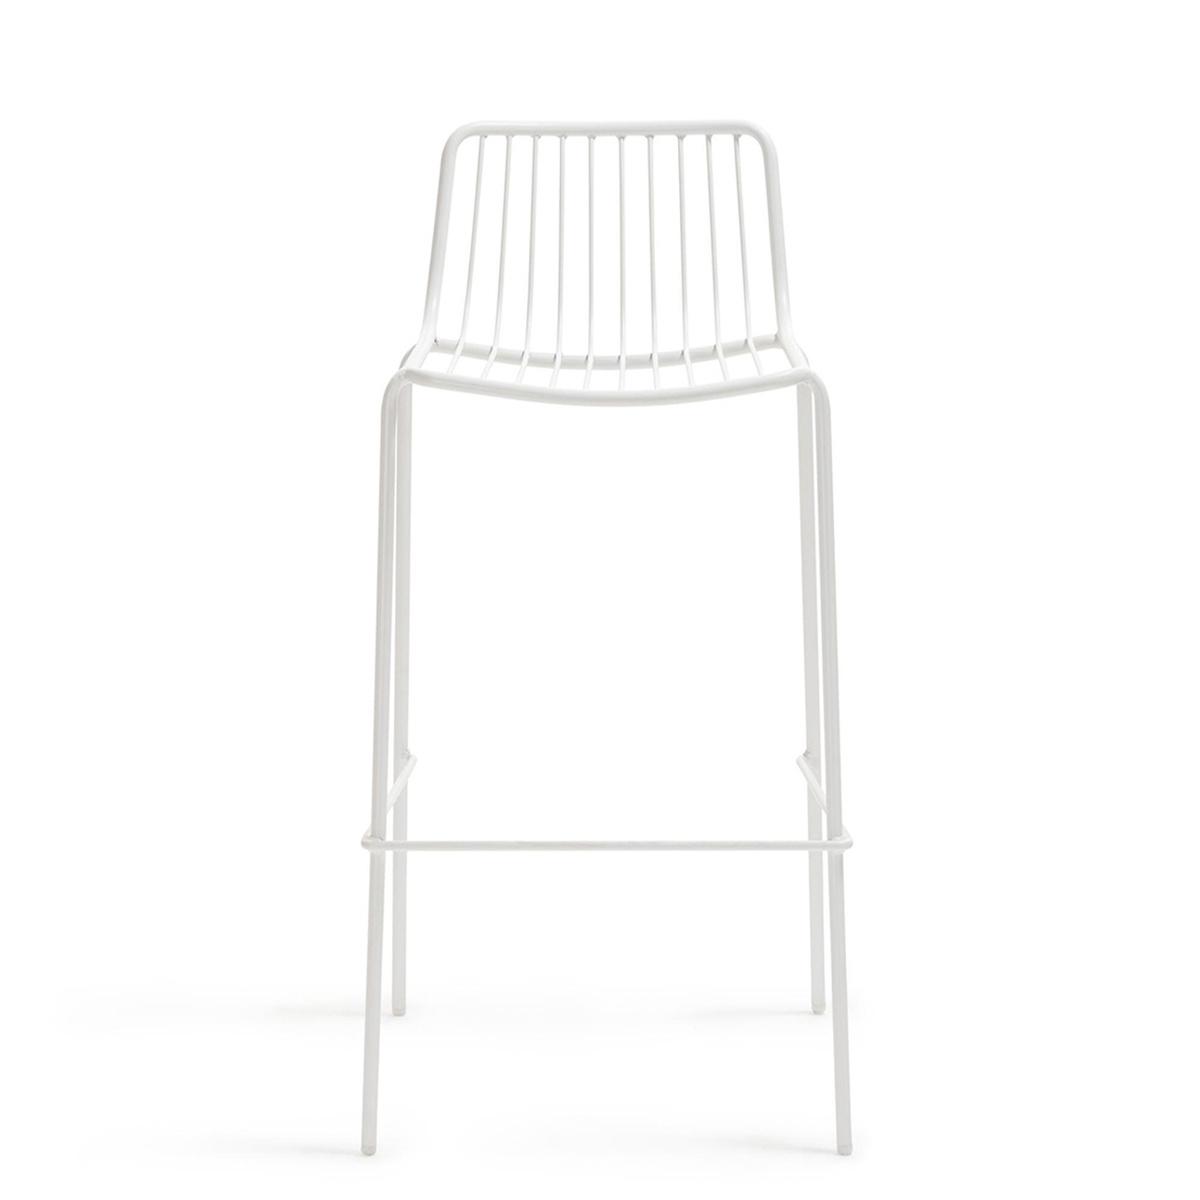 Wondrous Nolita Tall Garden Stool Uwap Interior Chair Design Uwaporg